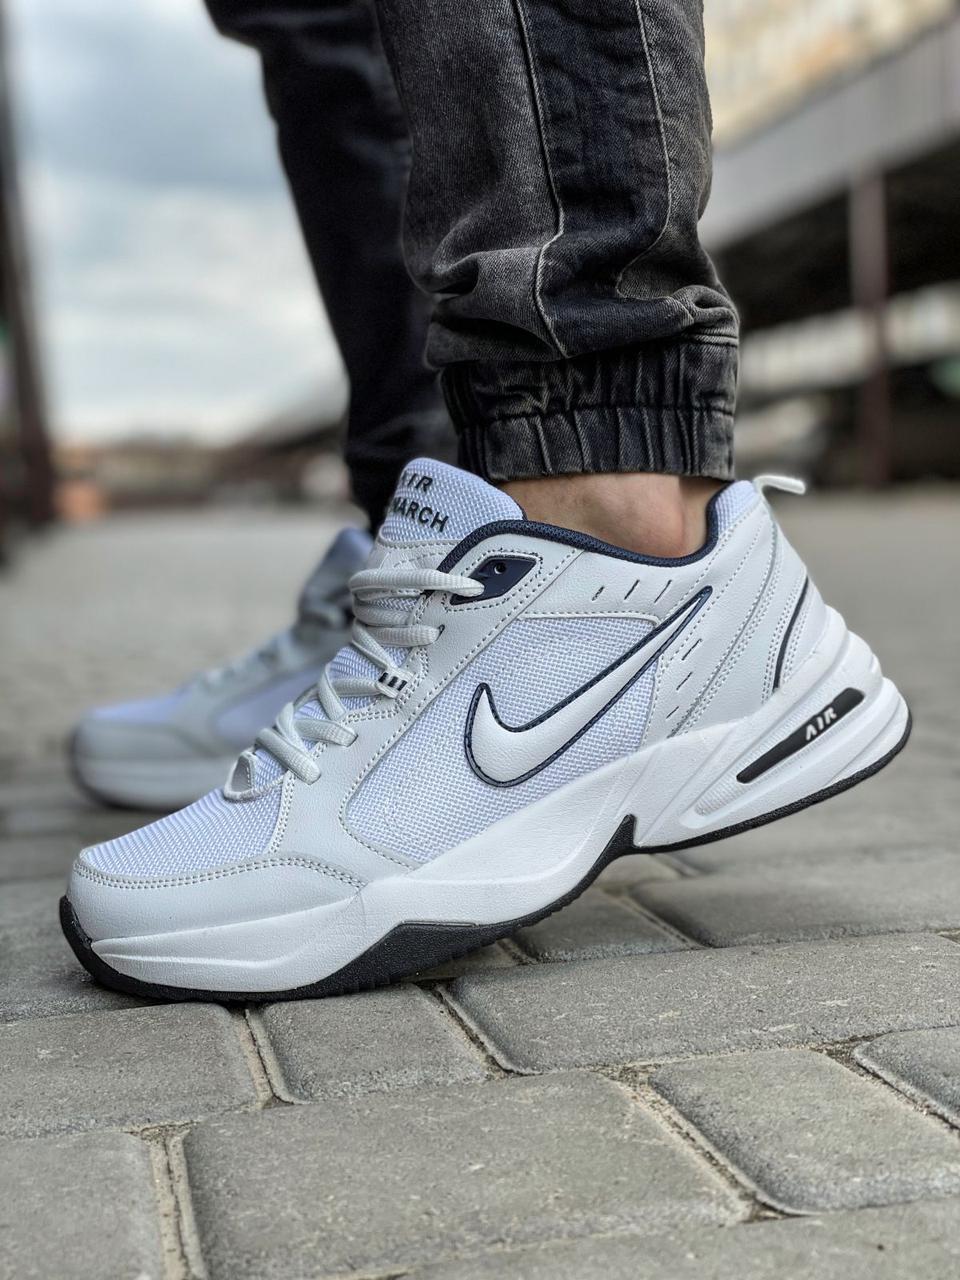 Мужские кроссовки Nike Air Monarch белые / Найк Монарх (Топ реплика ААА+)